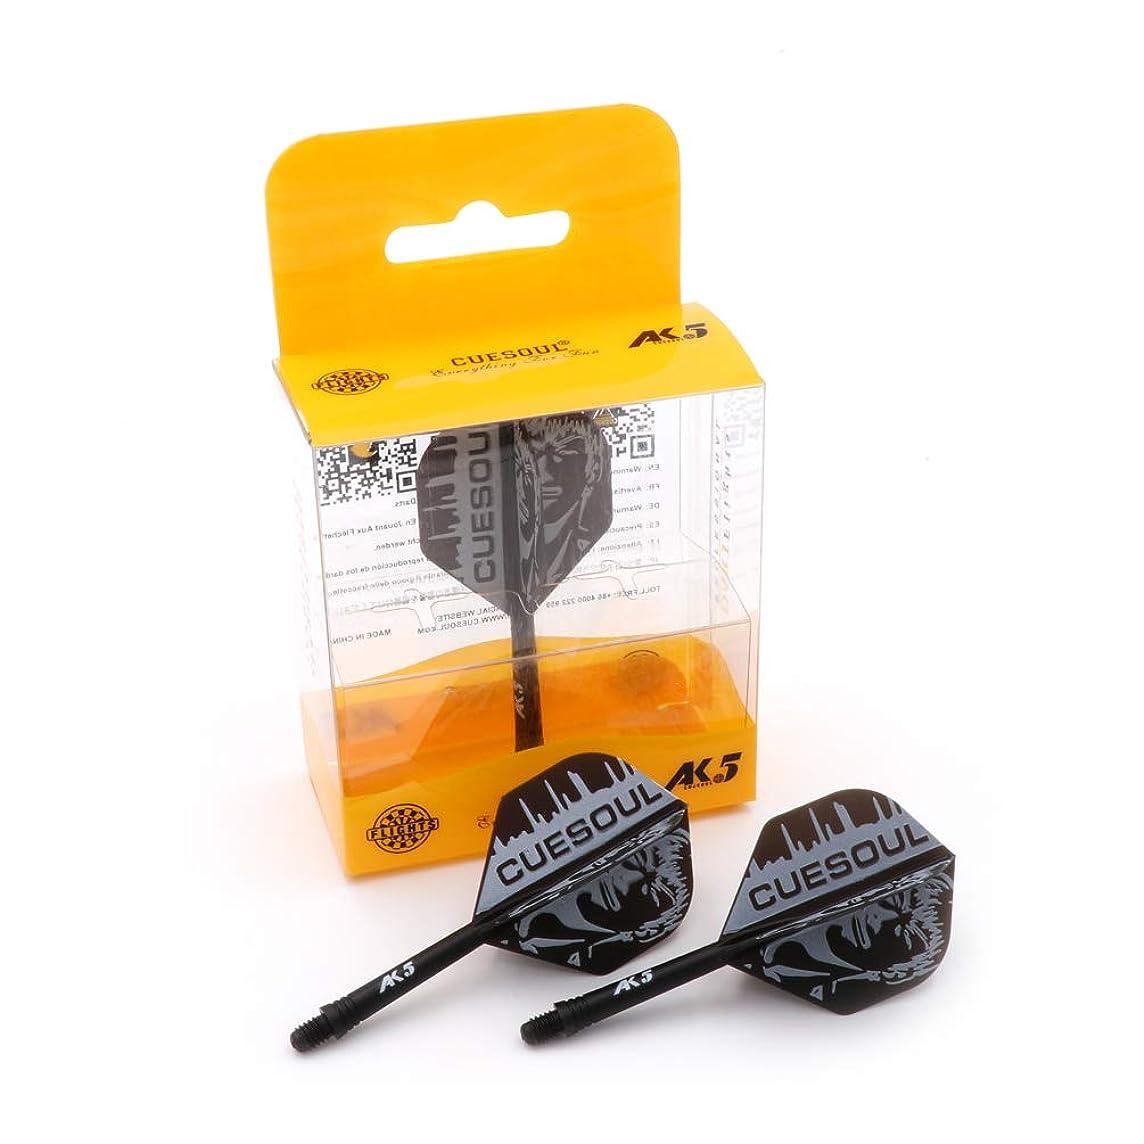 Black Scorpion CUESOUL ROST Integrated Dart Shaft and Flights Standard Shape,Set of 3 pcs